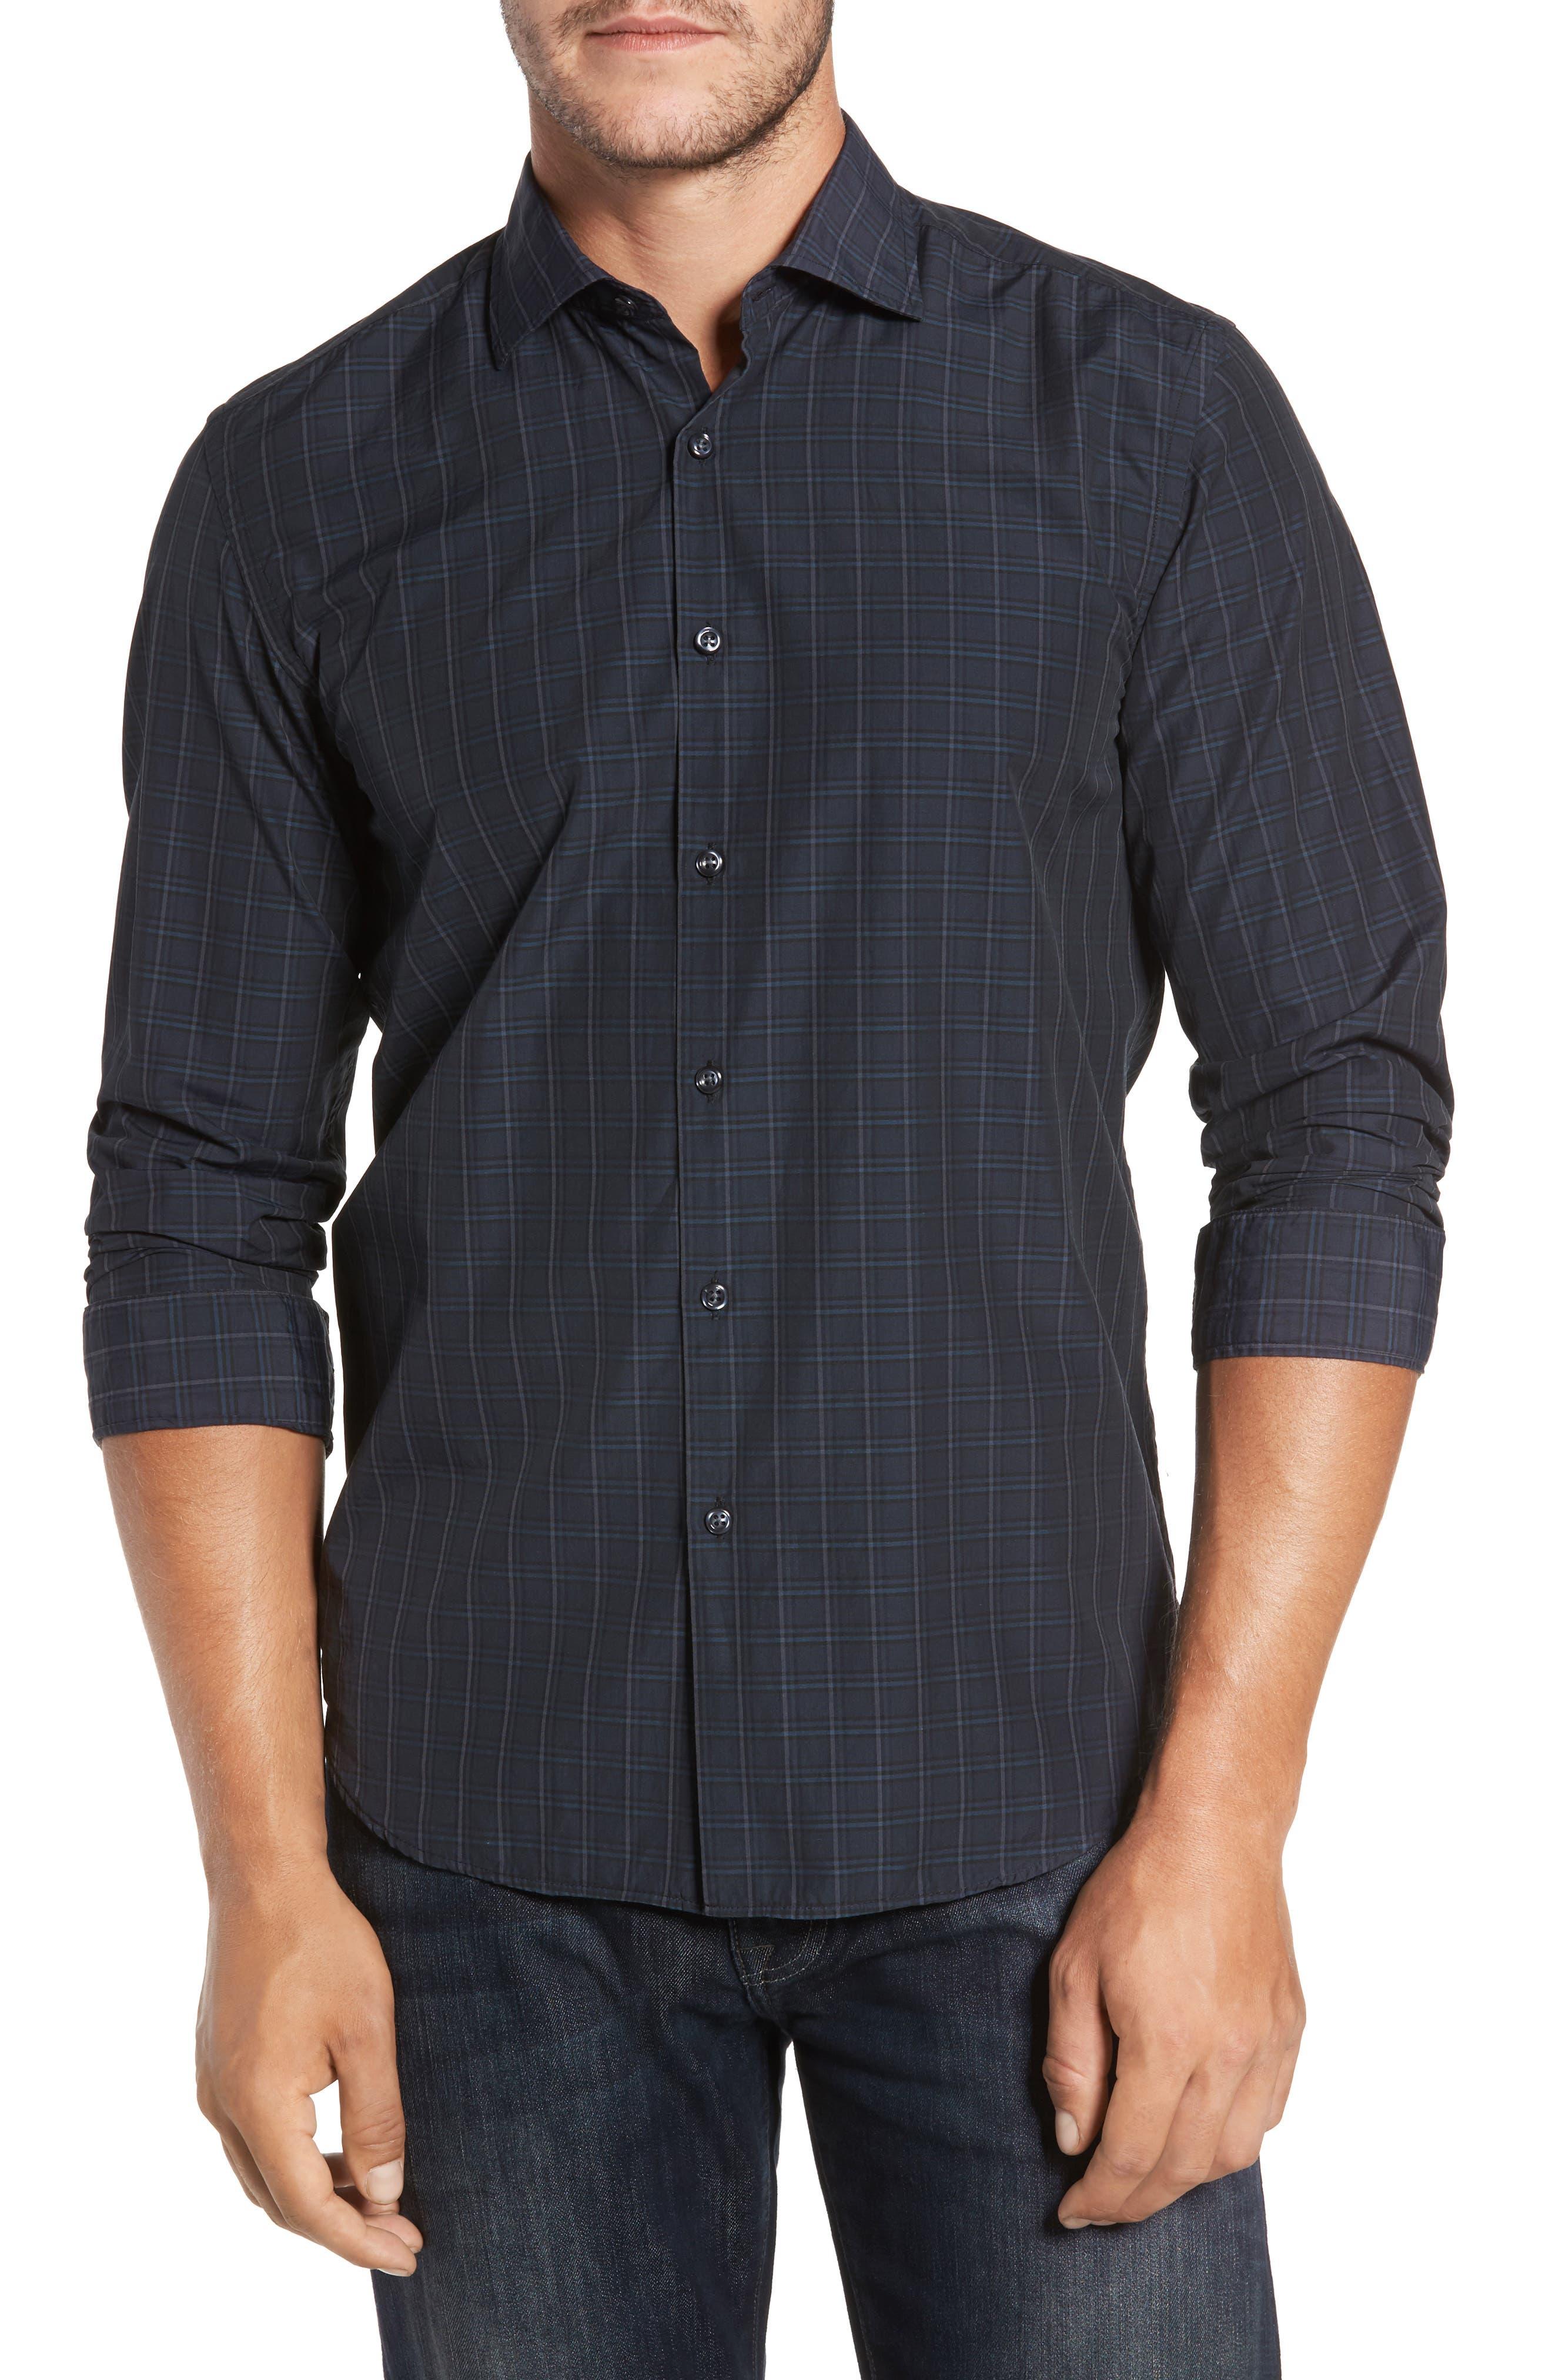 Main Image - Robert Barakett Charleston Regular Fit Plaid Sport Shirt